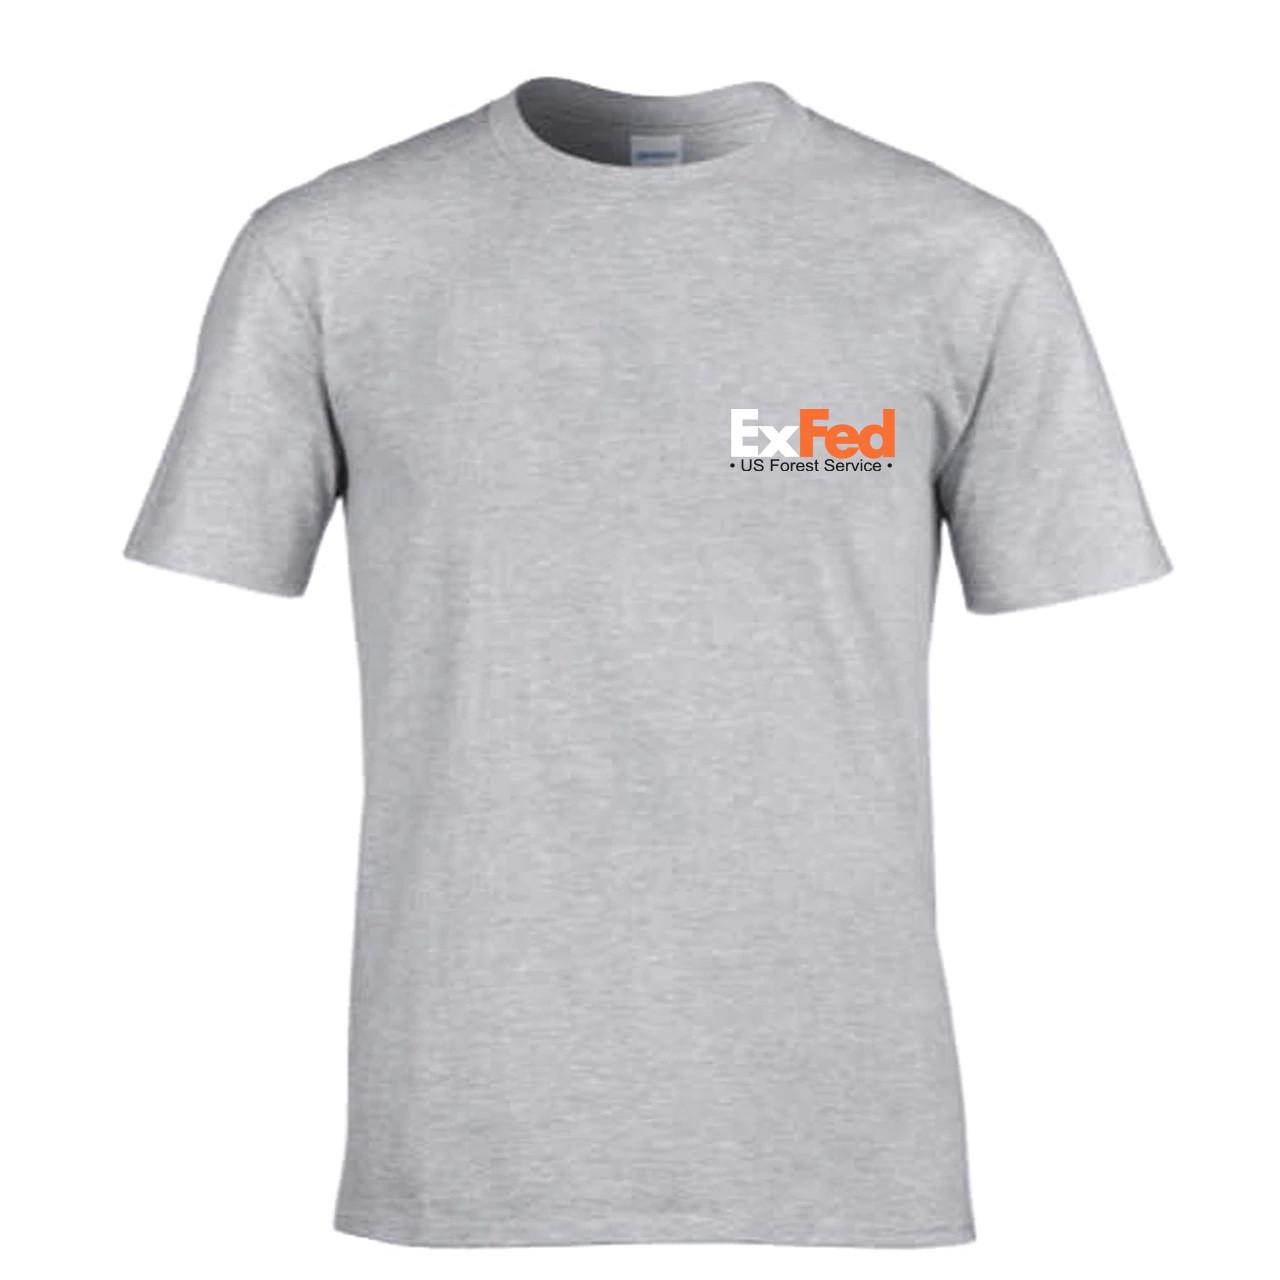 ExFed Shirt GREY